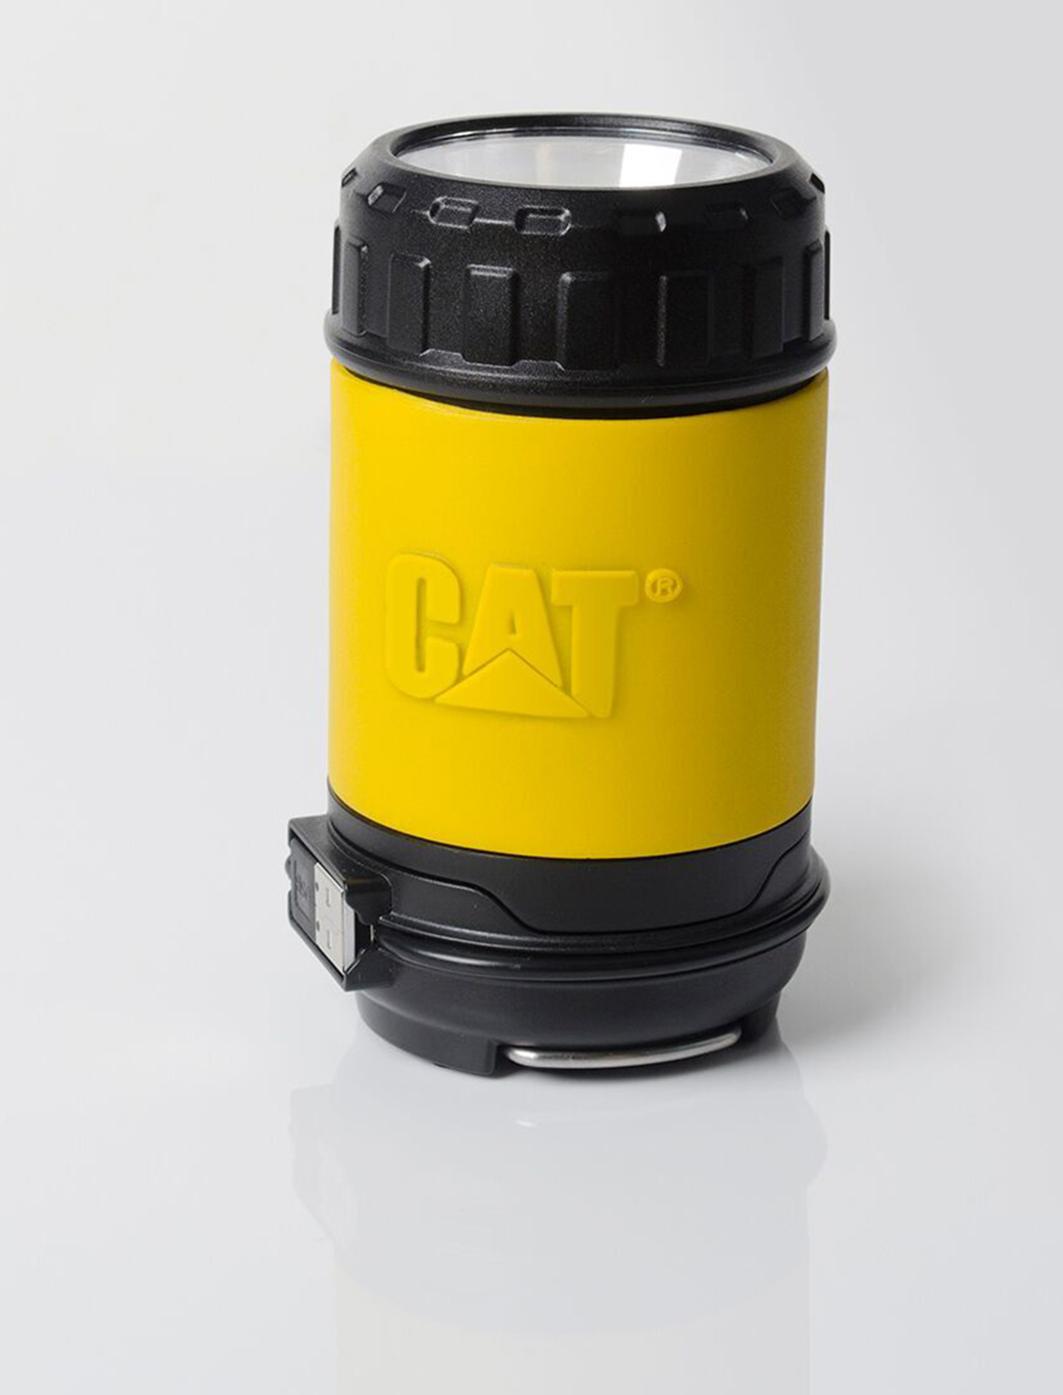 Lampe LED 2en1 rechargeable 225 lumen Caterpillar